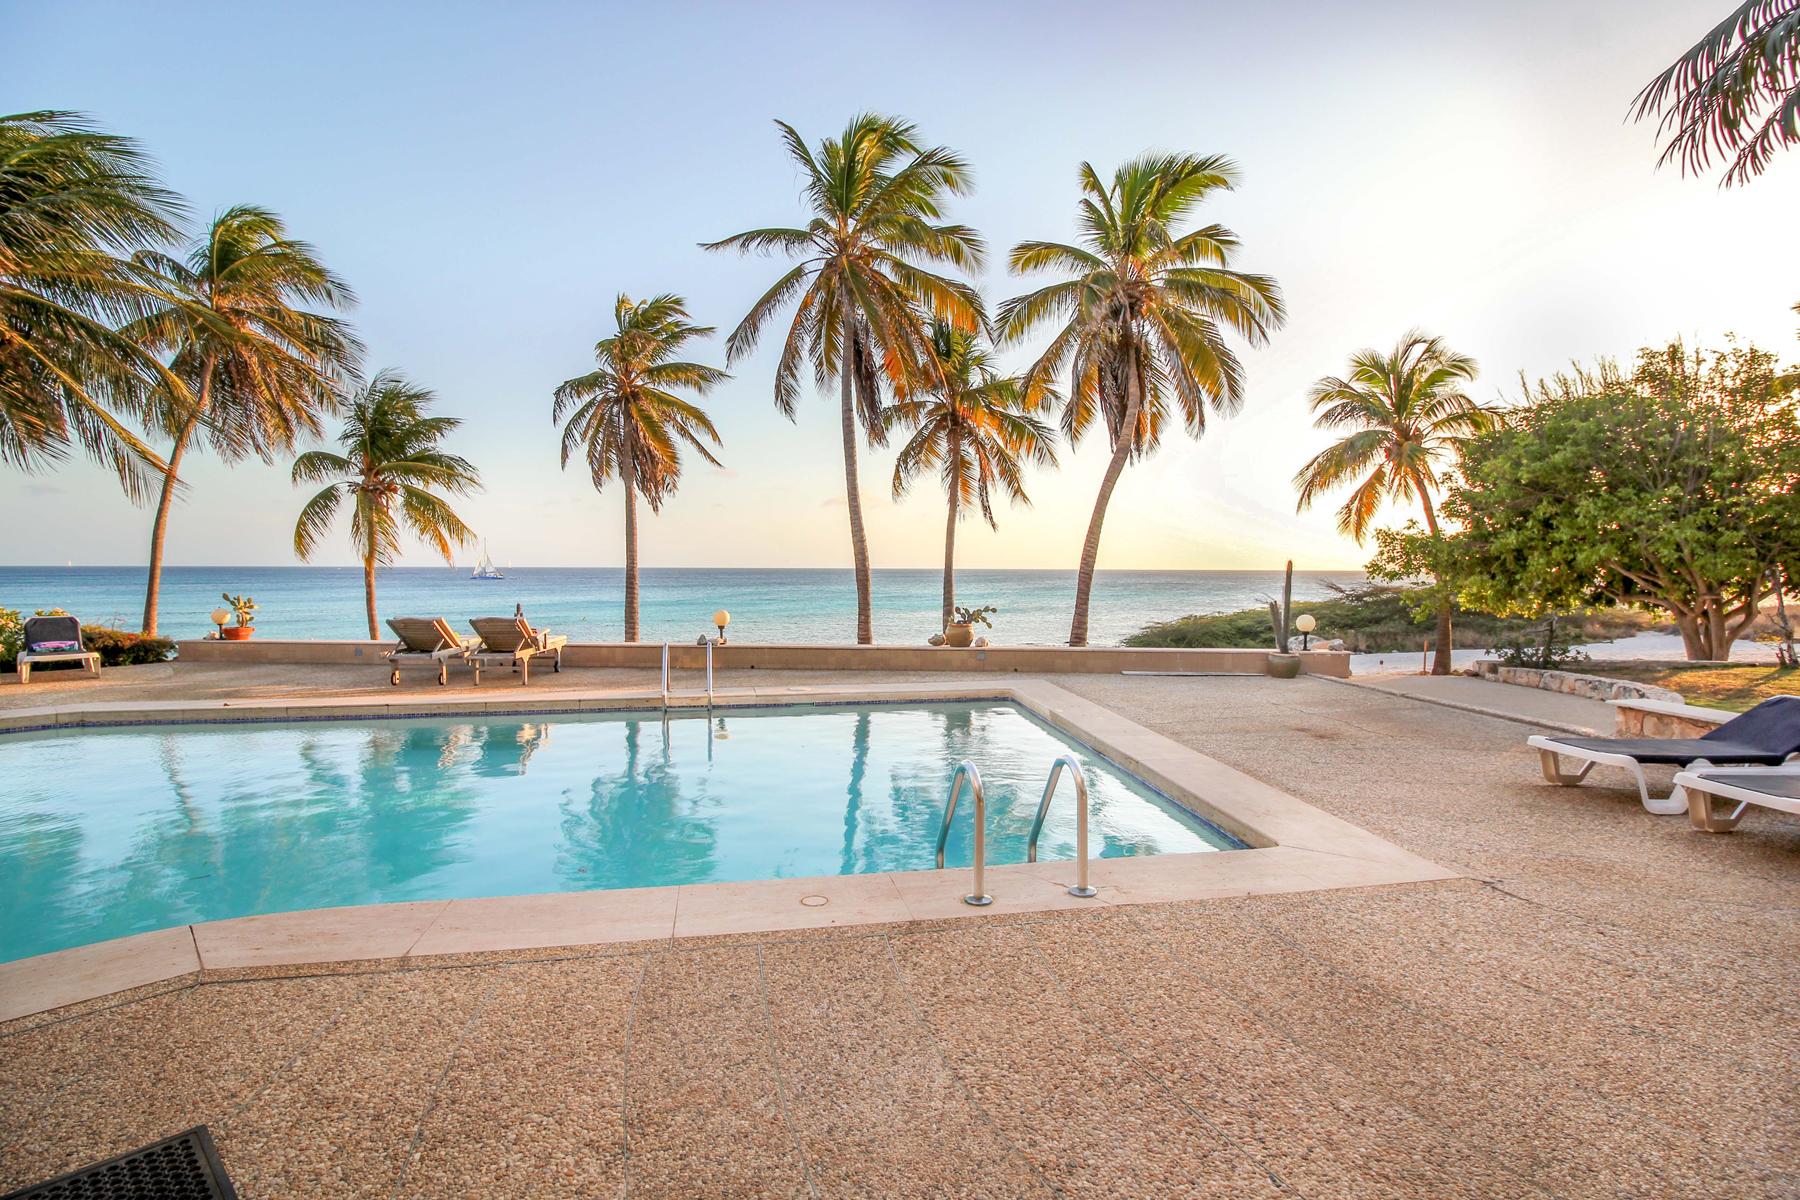 Additional photo for property listing at Ocean Edge Aruba Malmok, Aruba Aruba